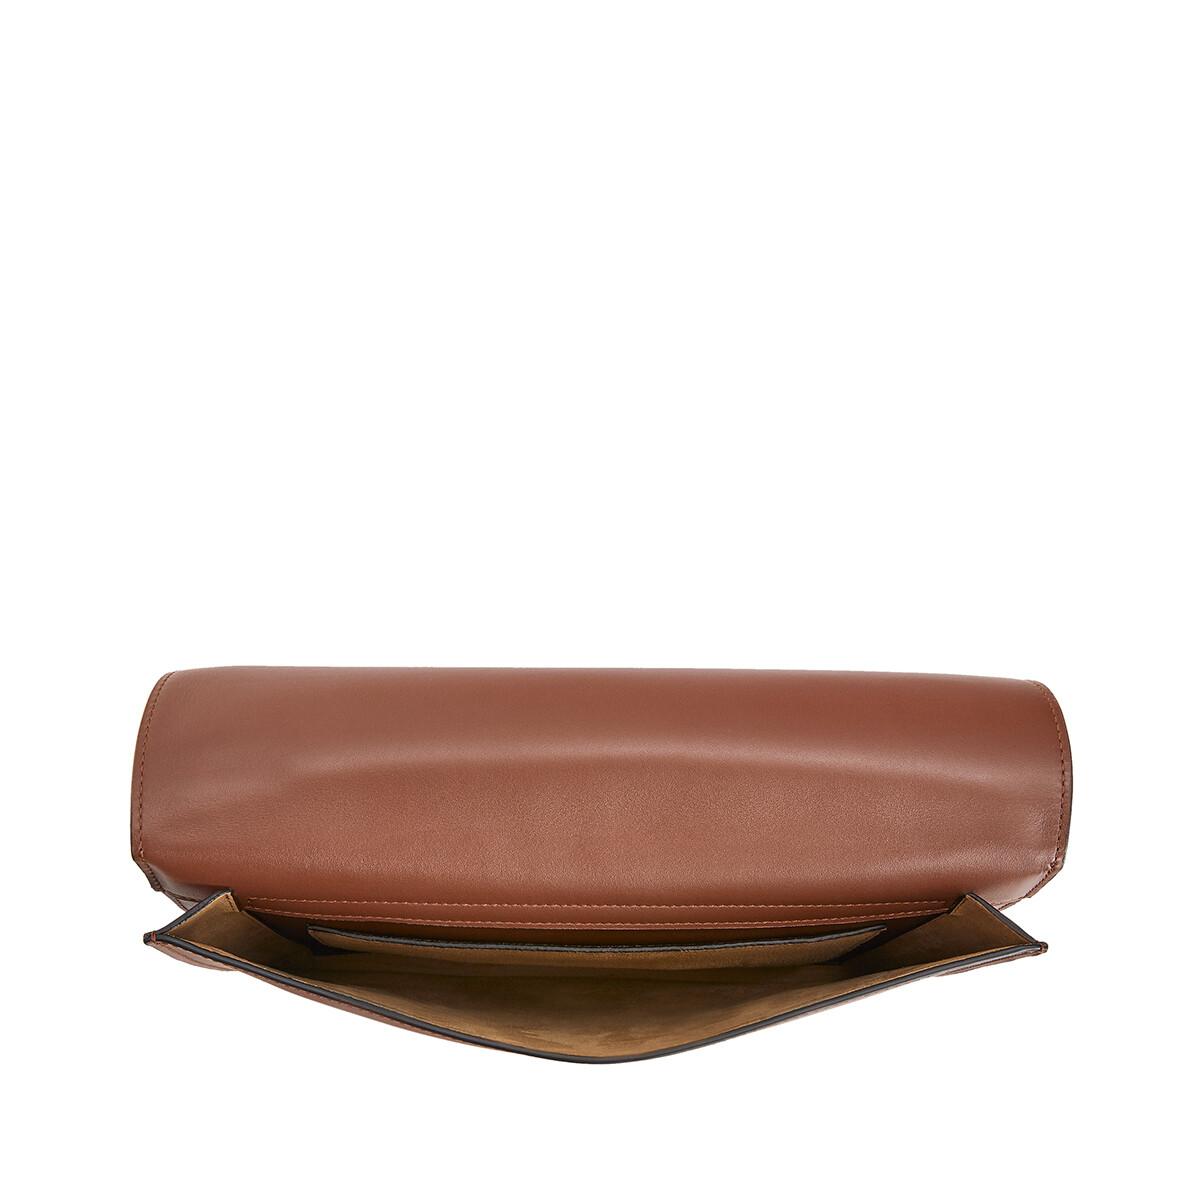 LOEWE Gusset Flat Messenger Bag Cognac front